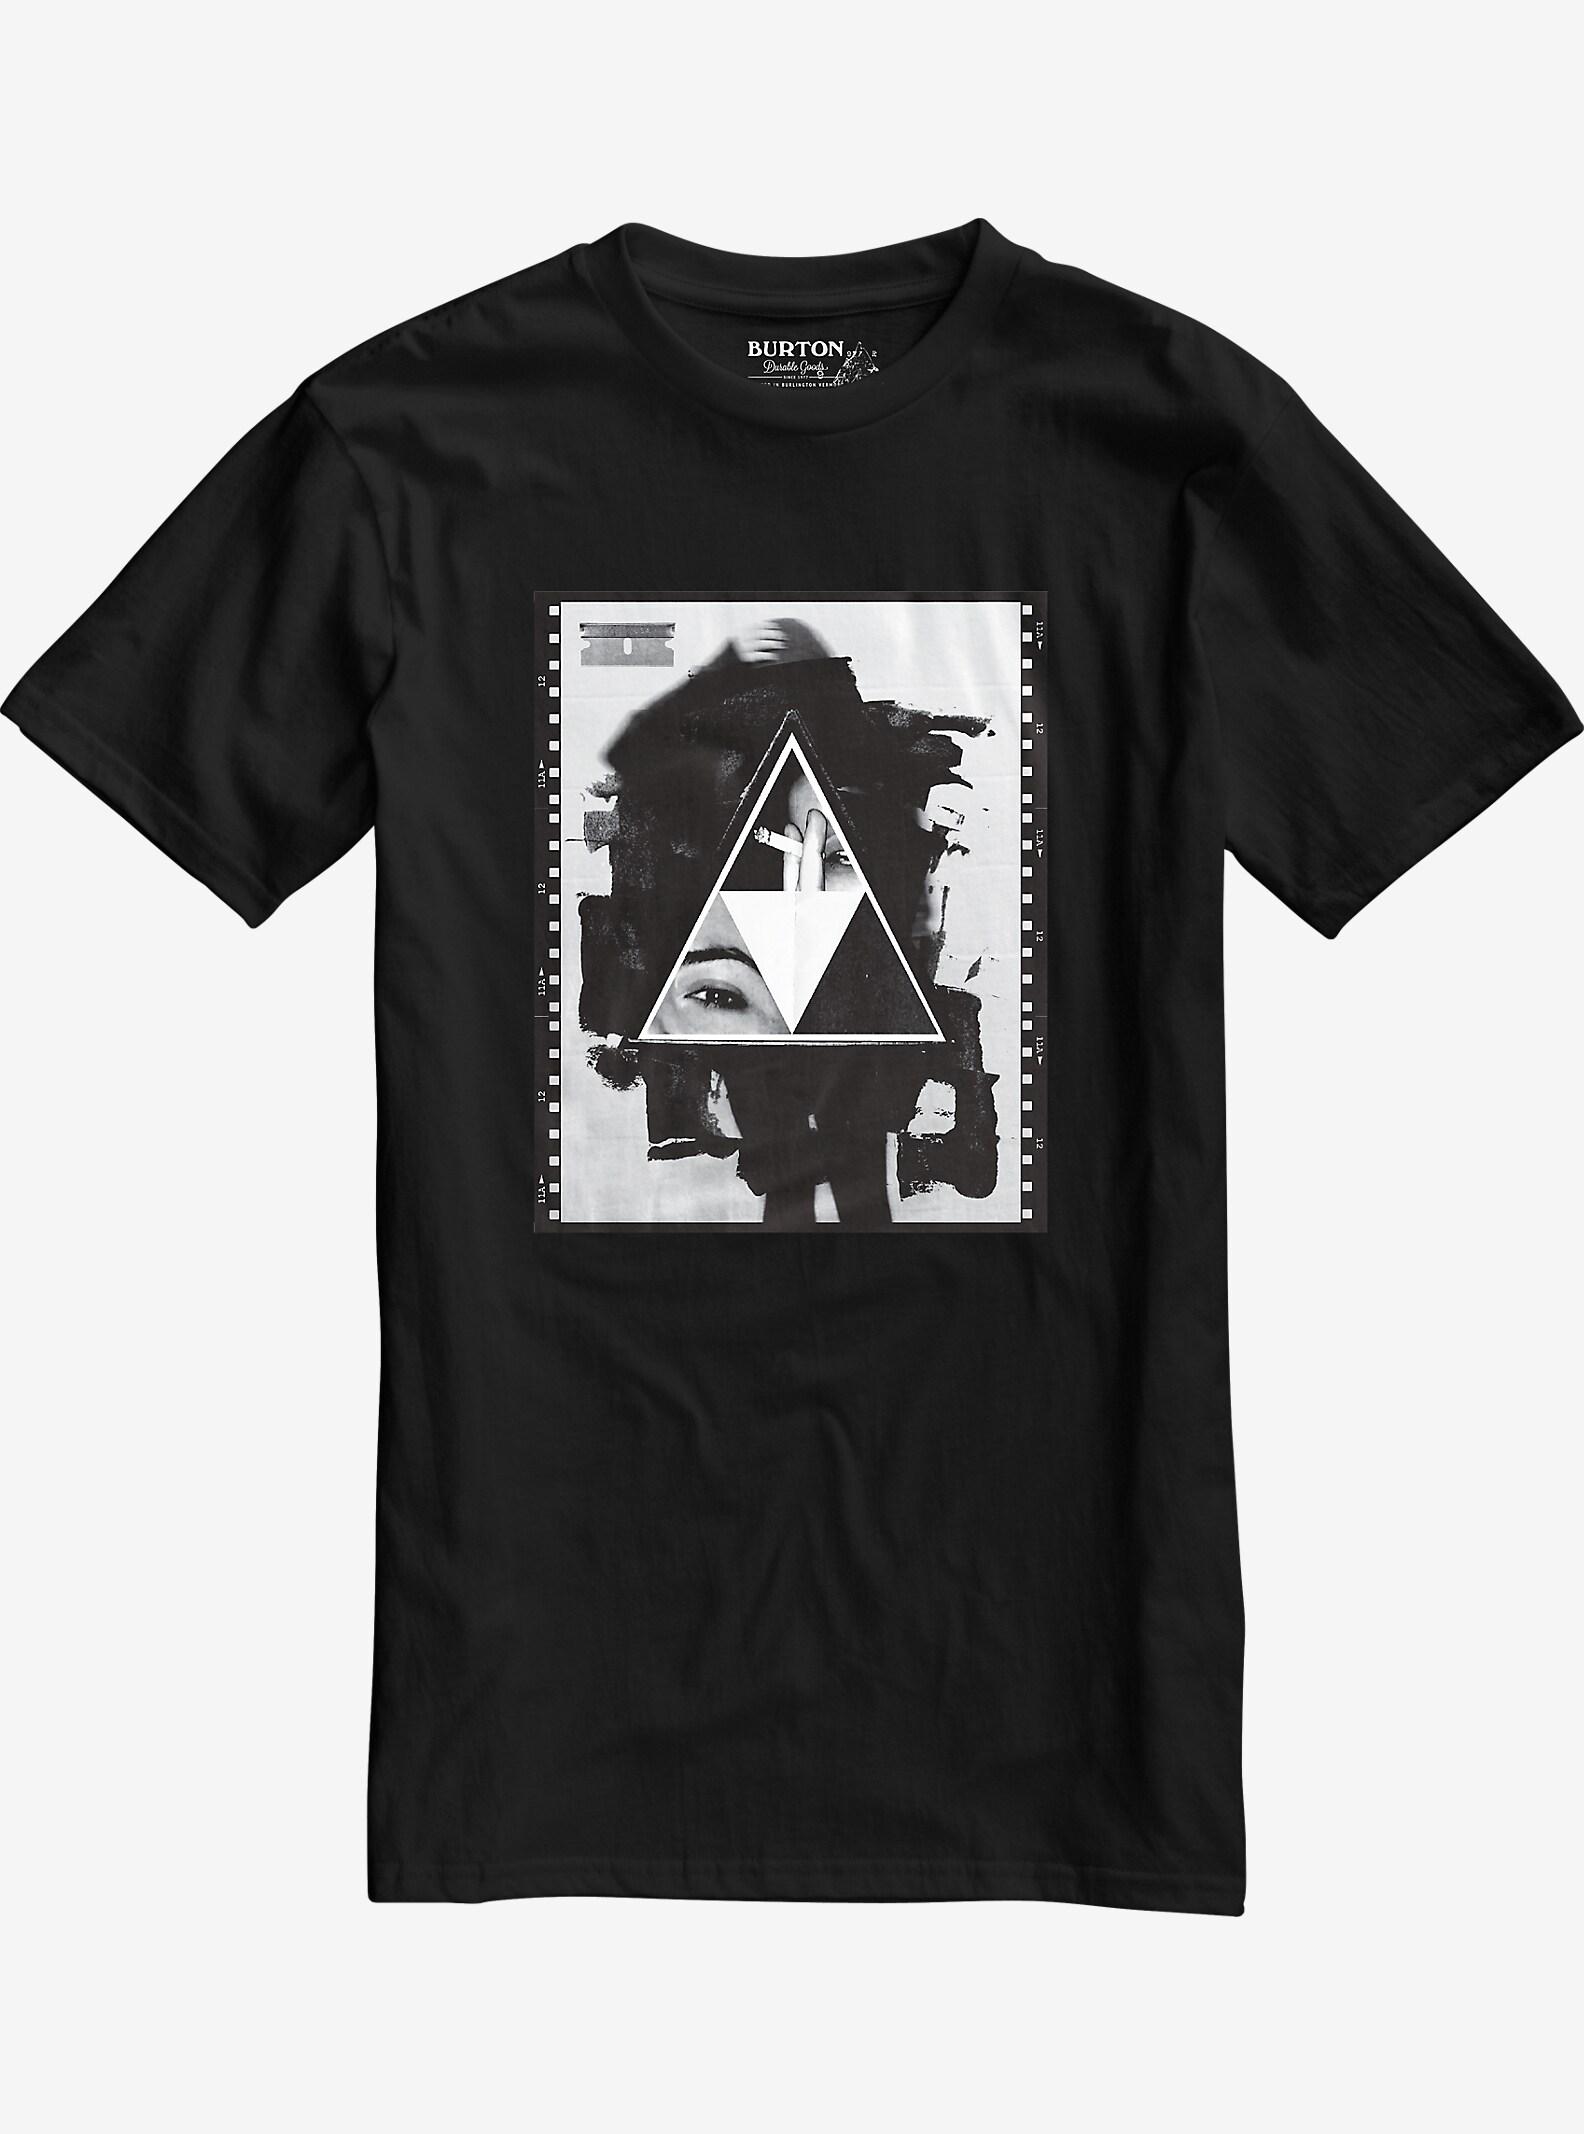 Burton Stockman Short Sleeve T Shirt shown in True Black